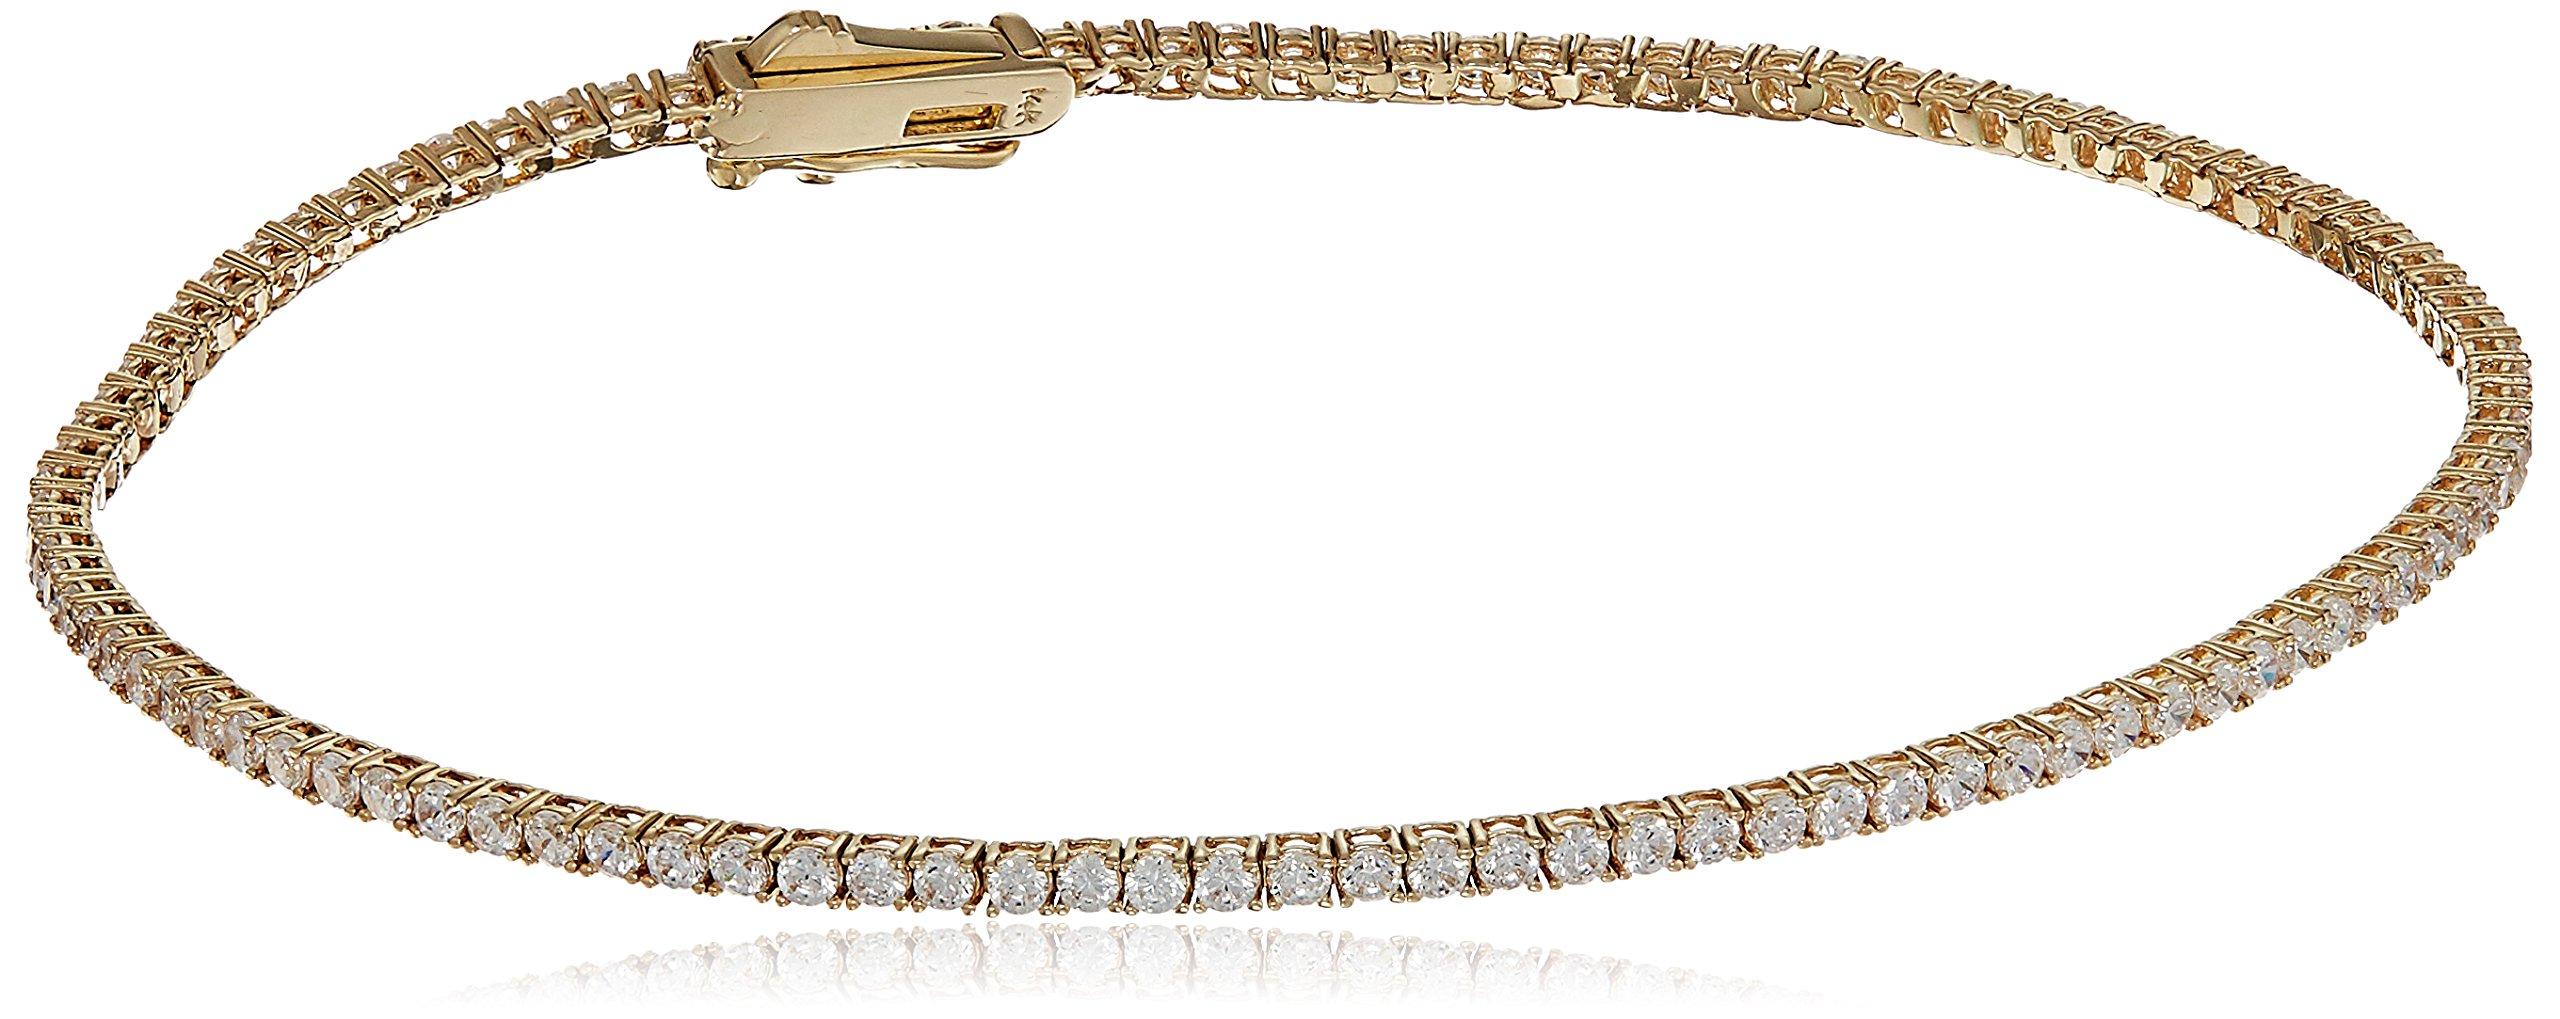 14k Yellow Gold Cubic Zirconia Round Brilliant Classic Style Eternity Tennis Bracelet, 7.25''